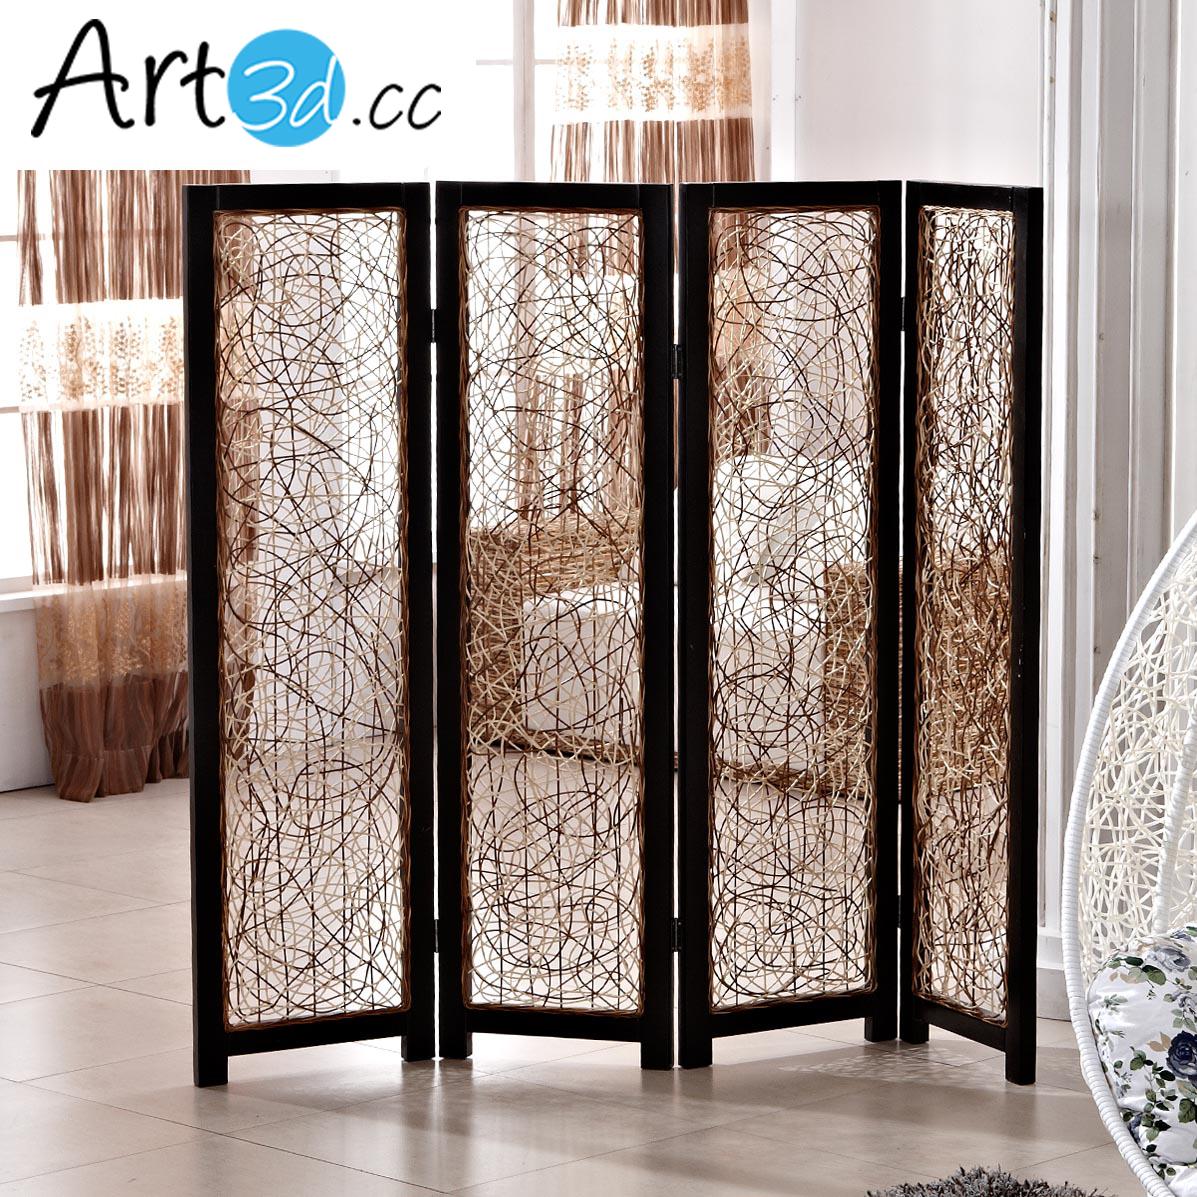 A42003 – Folding Screen Walls 1 Set 4 Panels